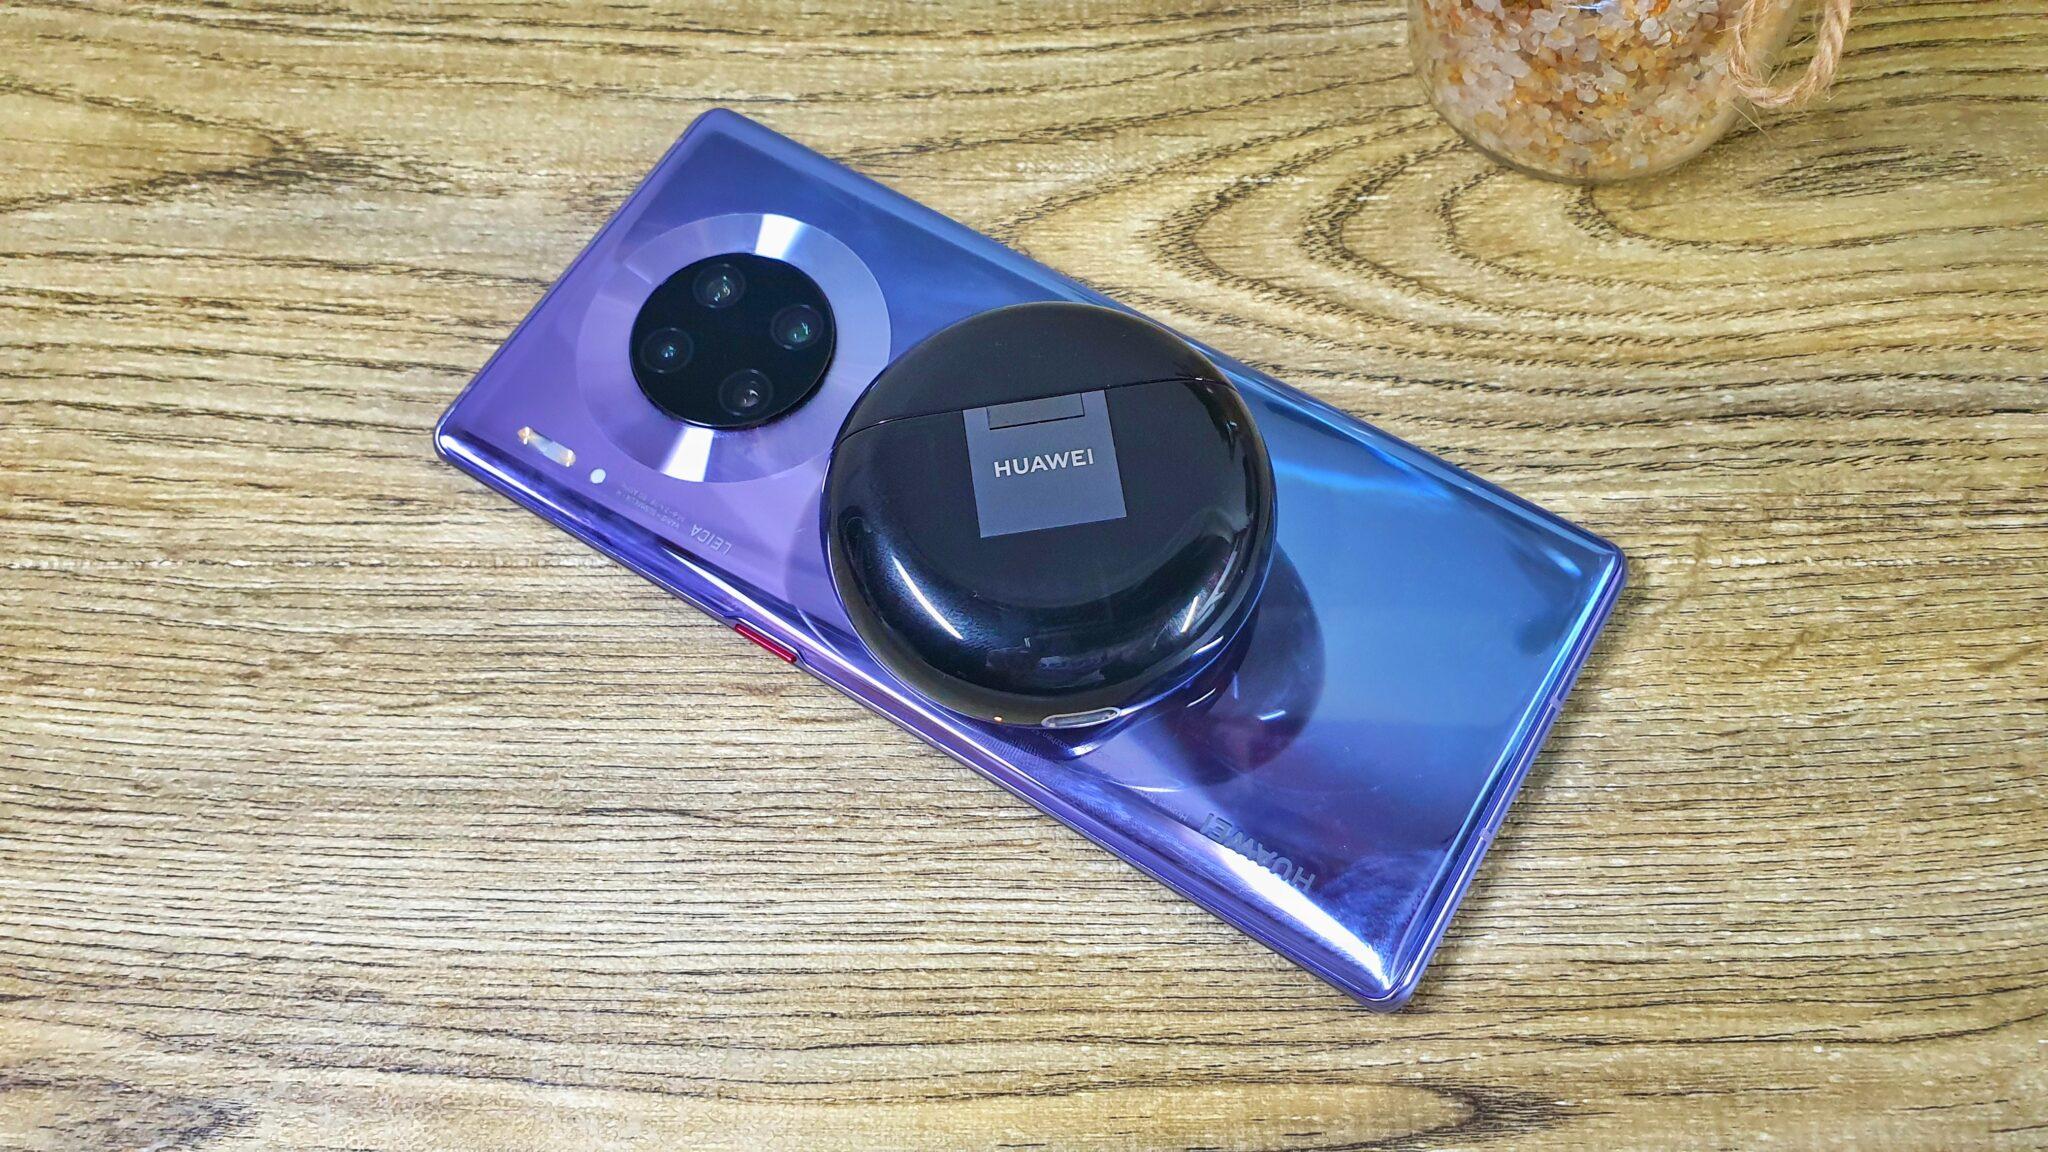 FreeBuds 3 reverse wireless charging